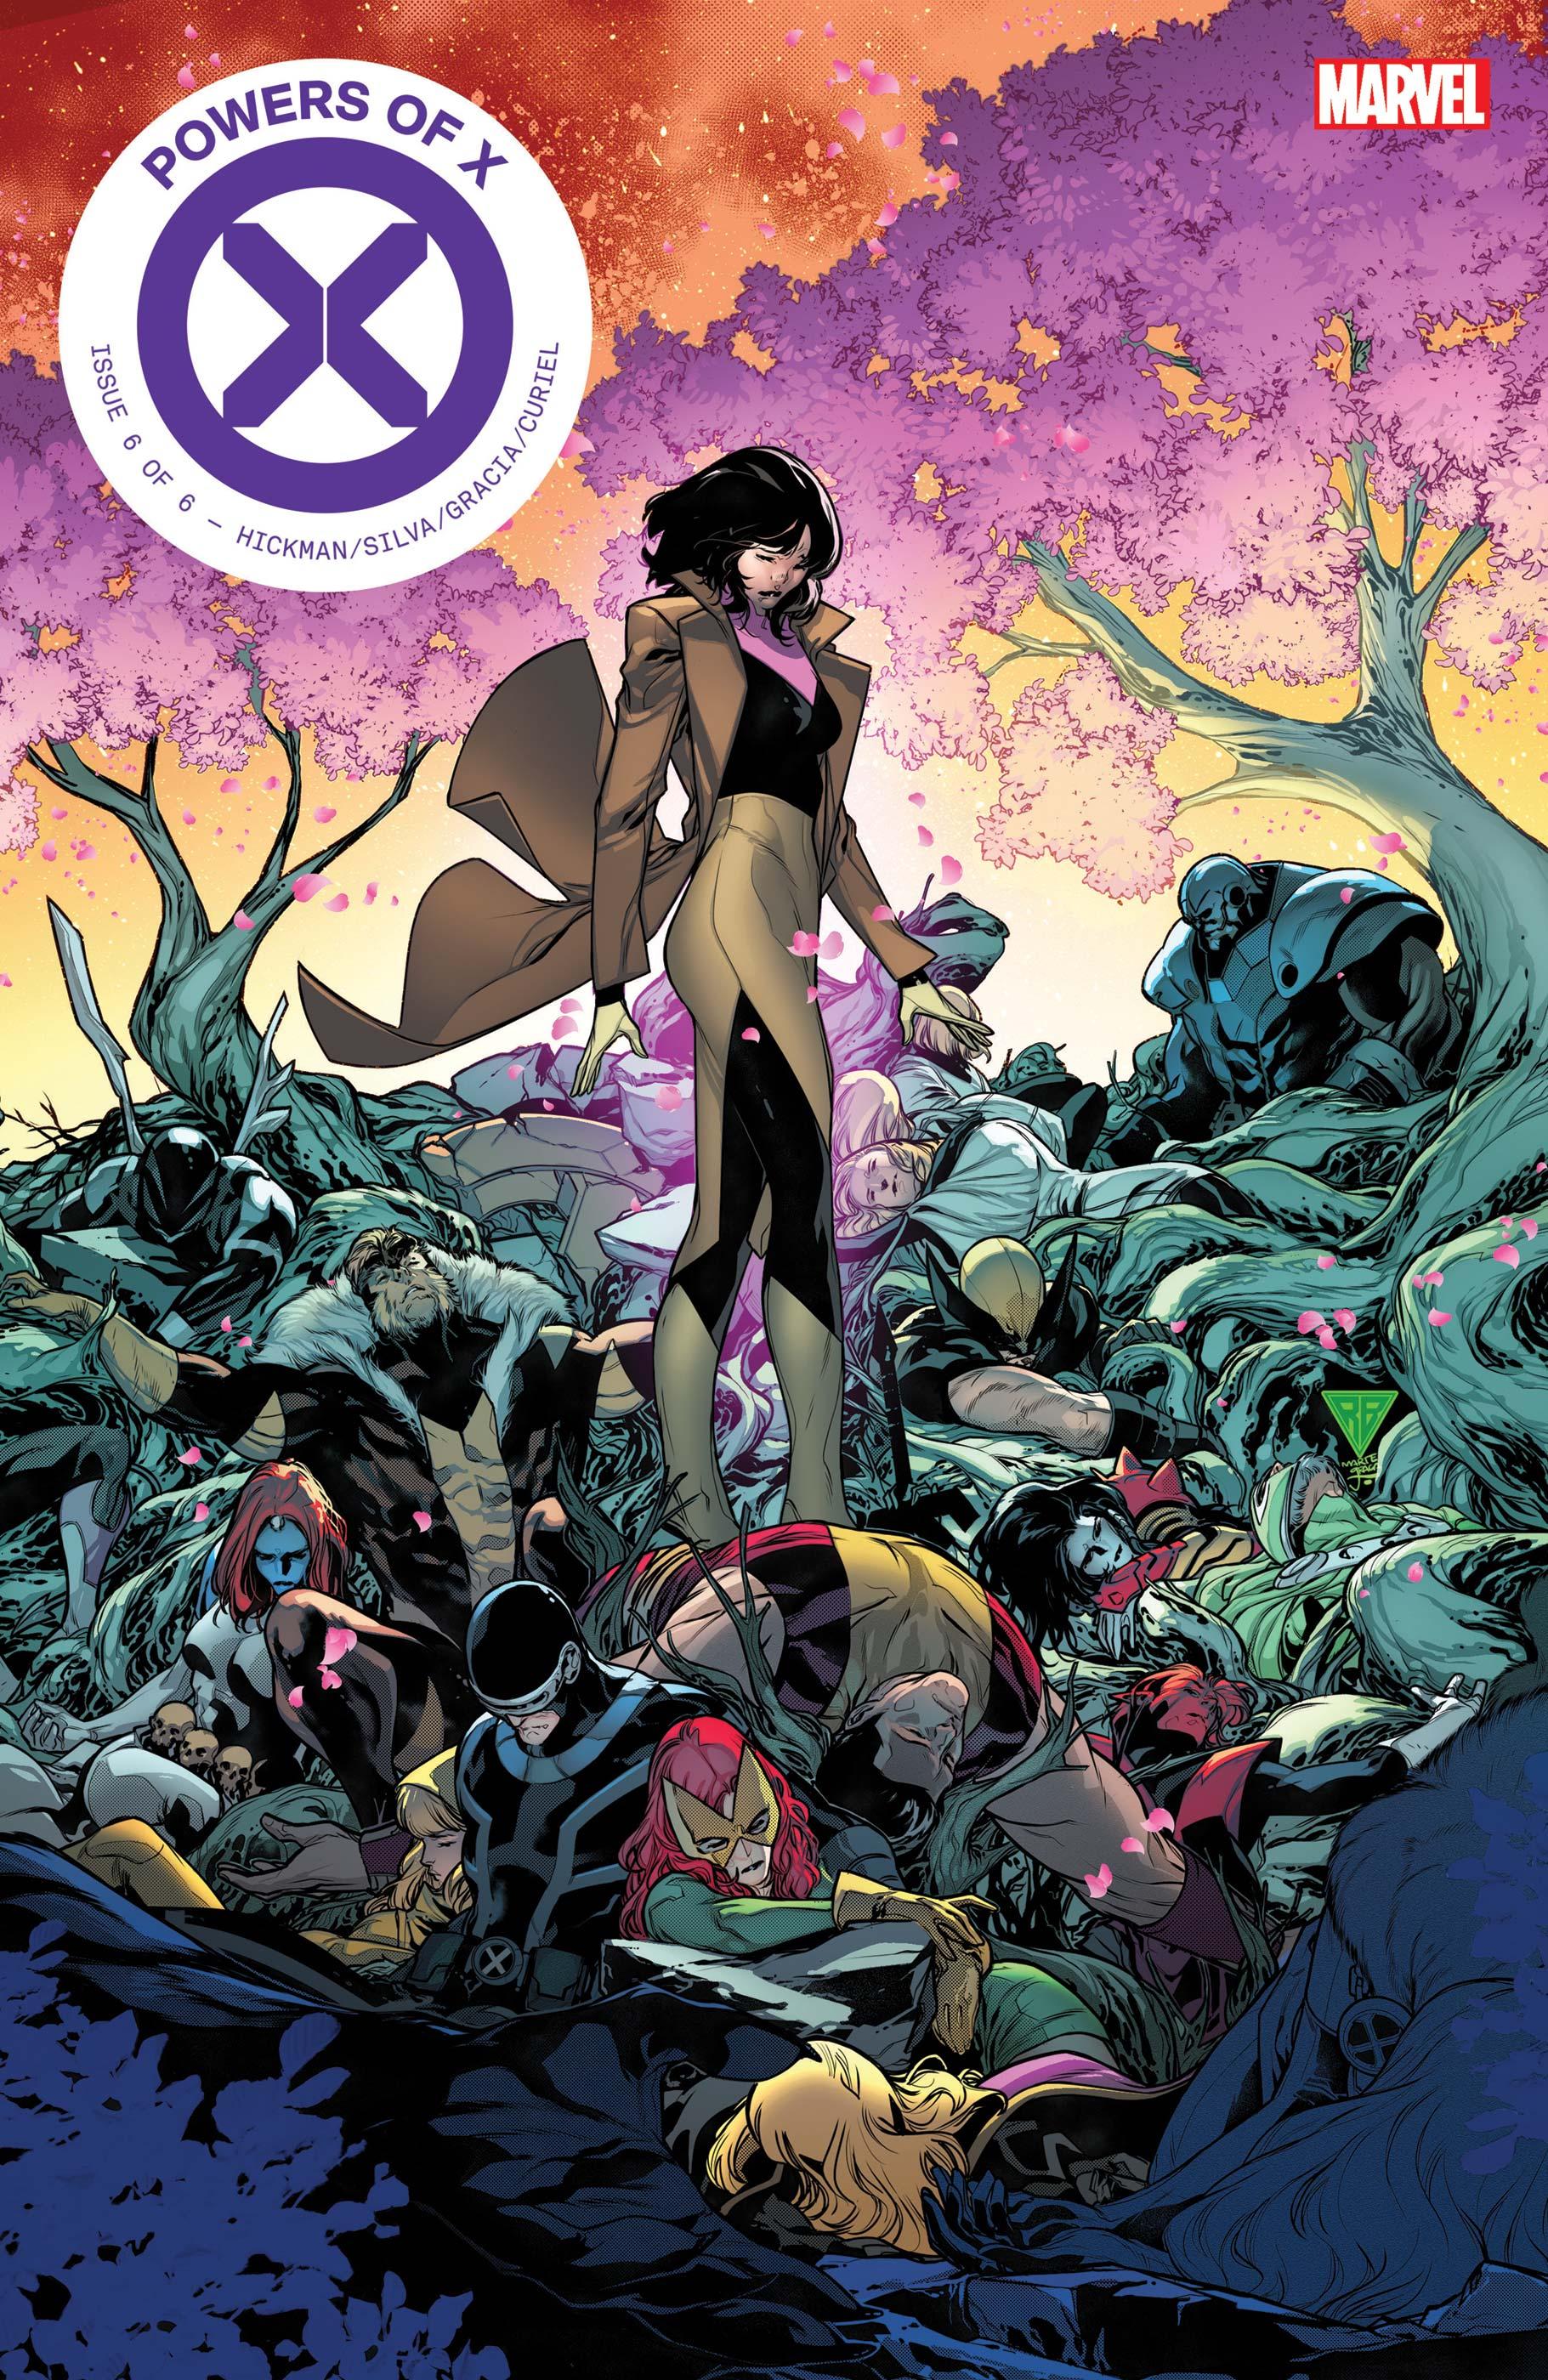 Marvel Powers of X #2 Comic Book